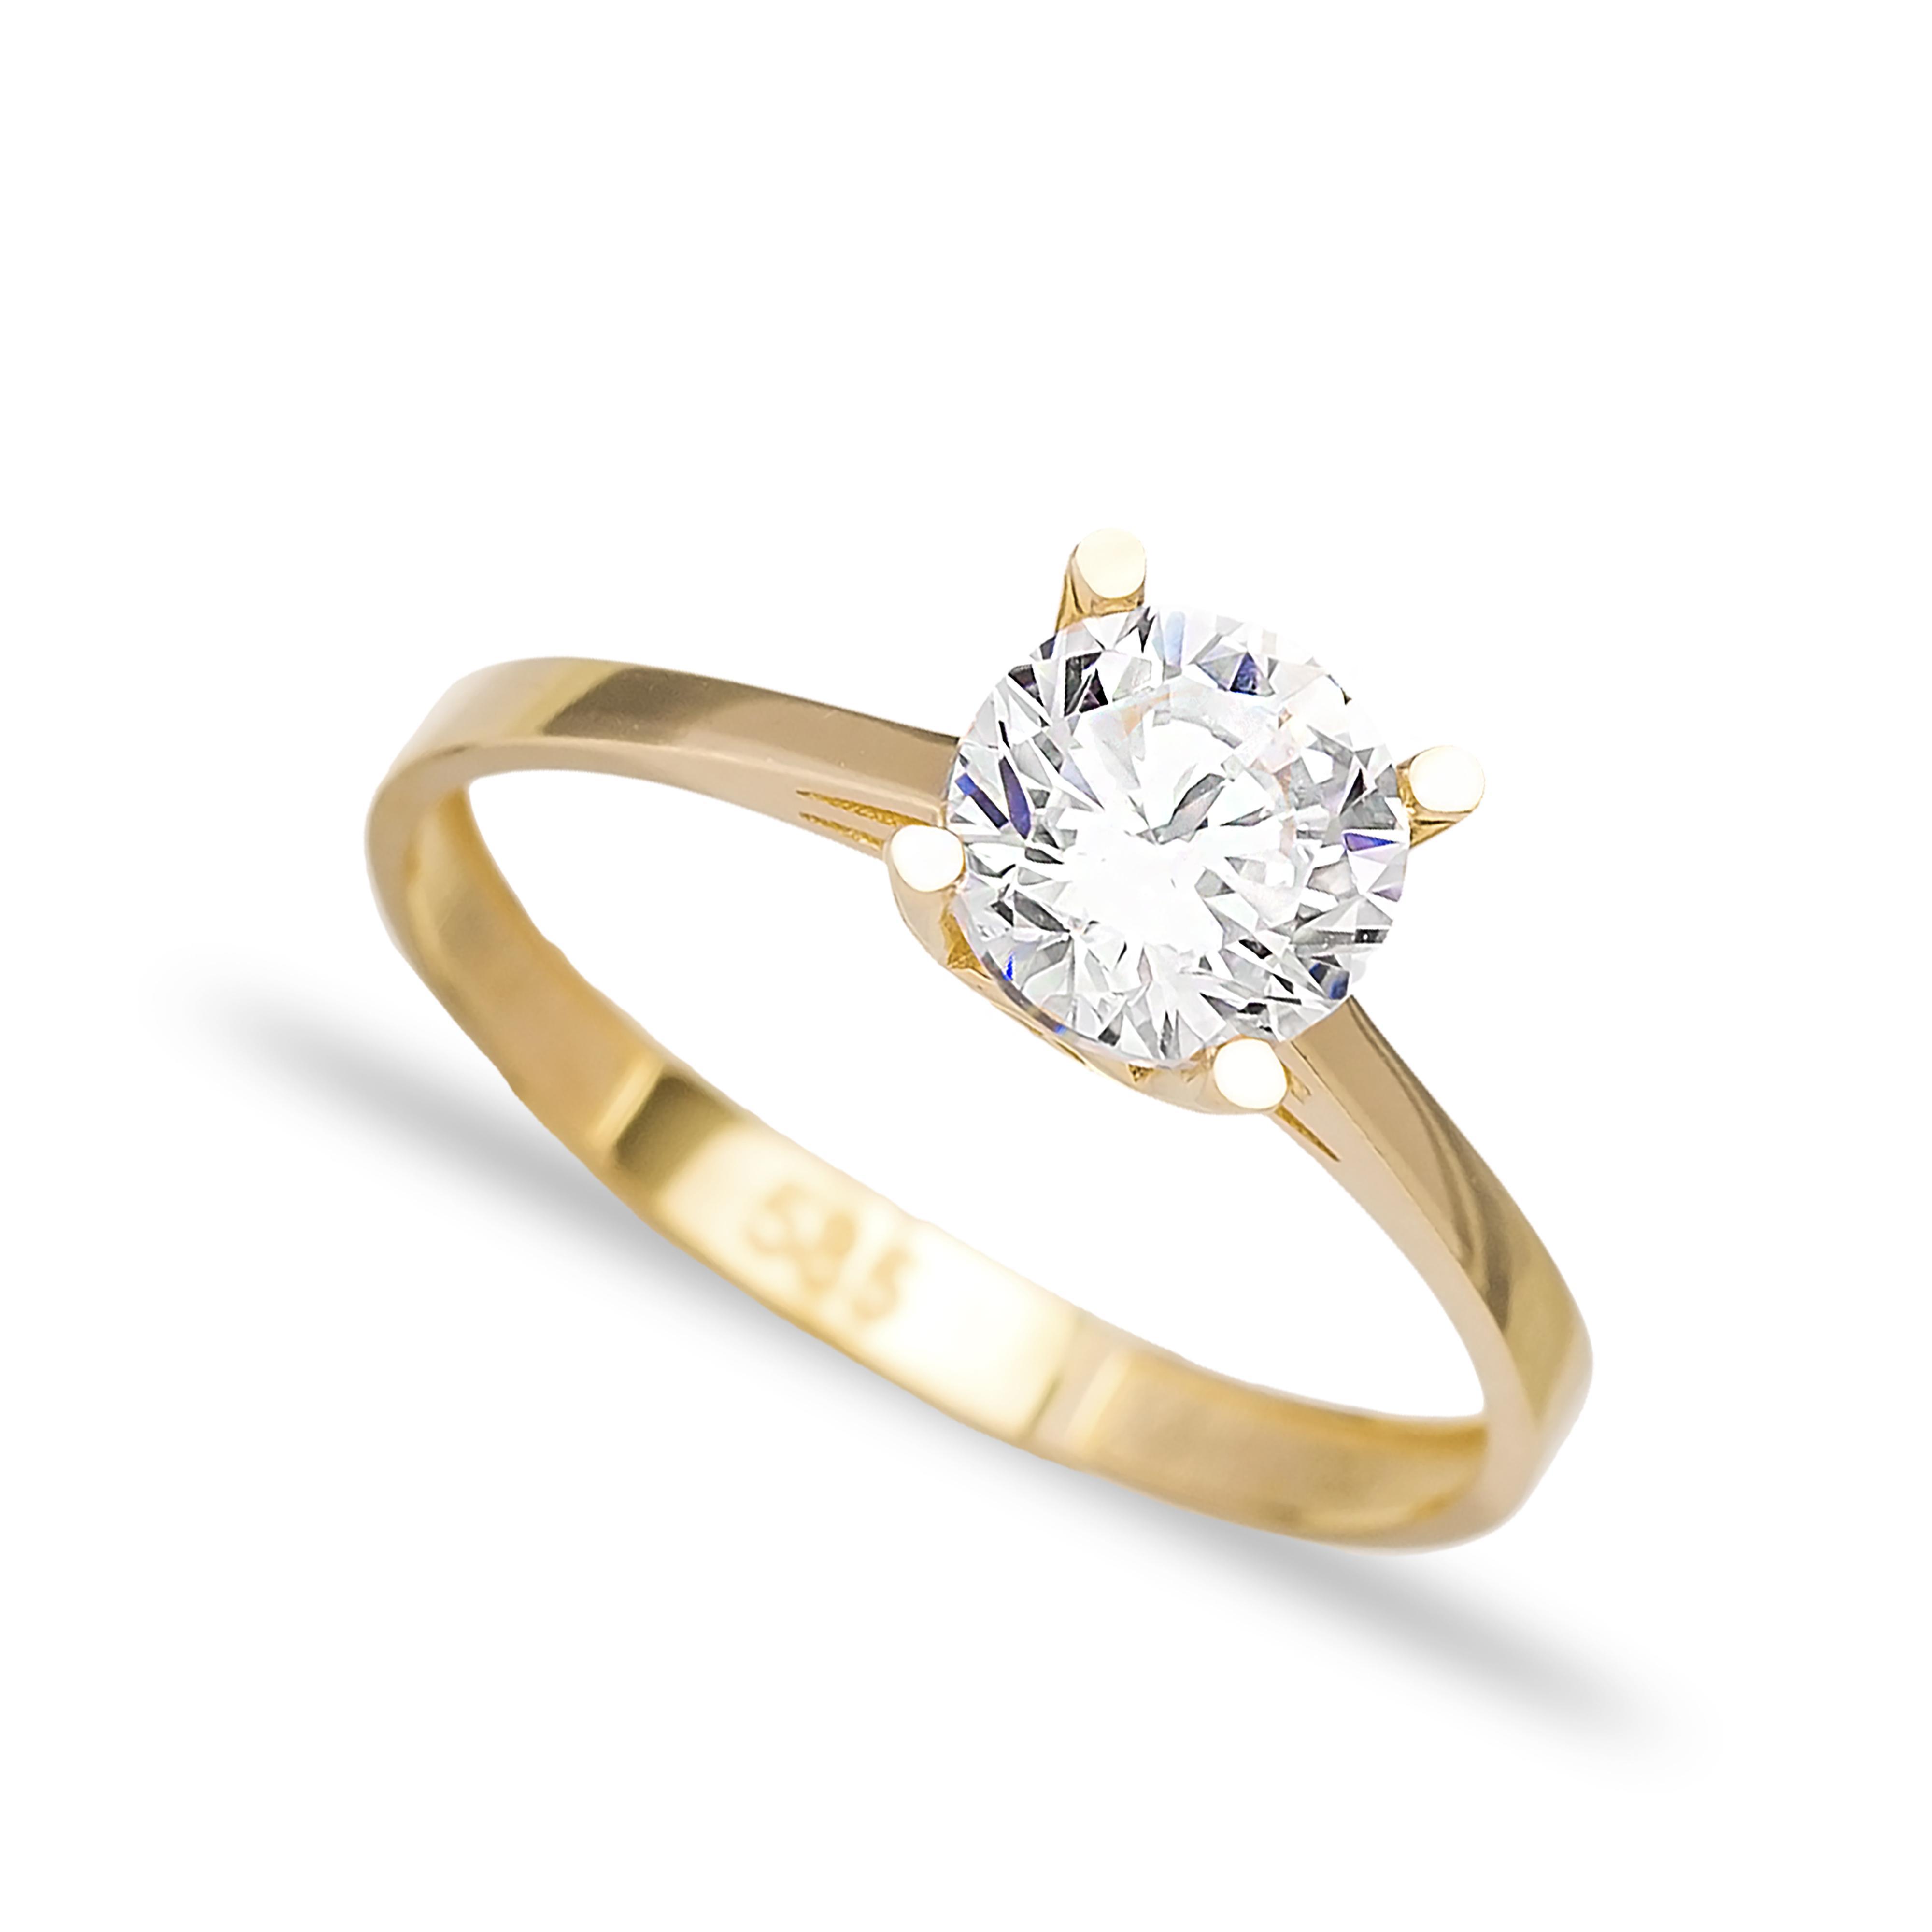 Engagement Solitaire 14 Karat Gold Zircon 6.5mm Wholesale Handmade Turkish Jewelry